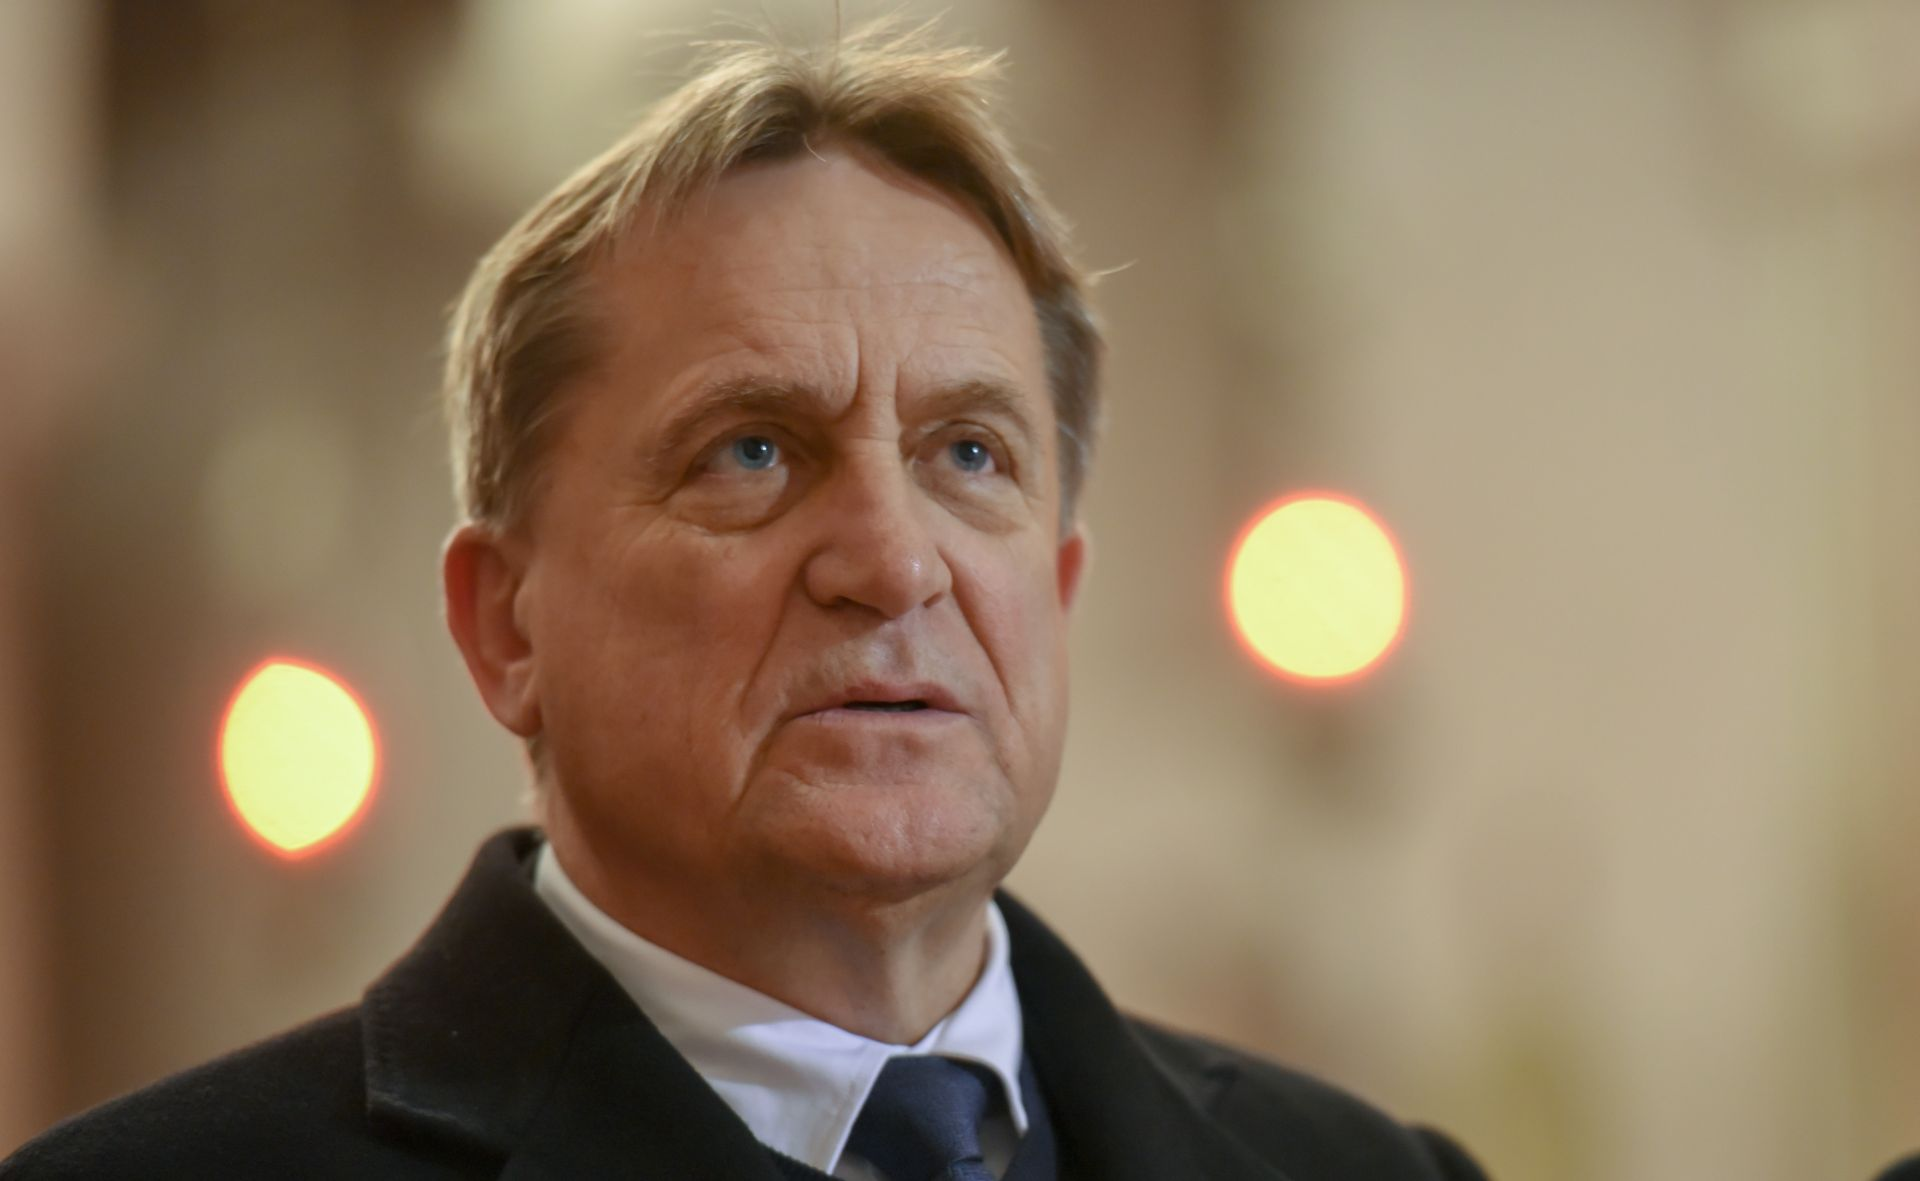 KALMETA 'Plenković je pokazao da je državnik i da zna pokazati državne poteze'